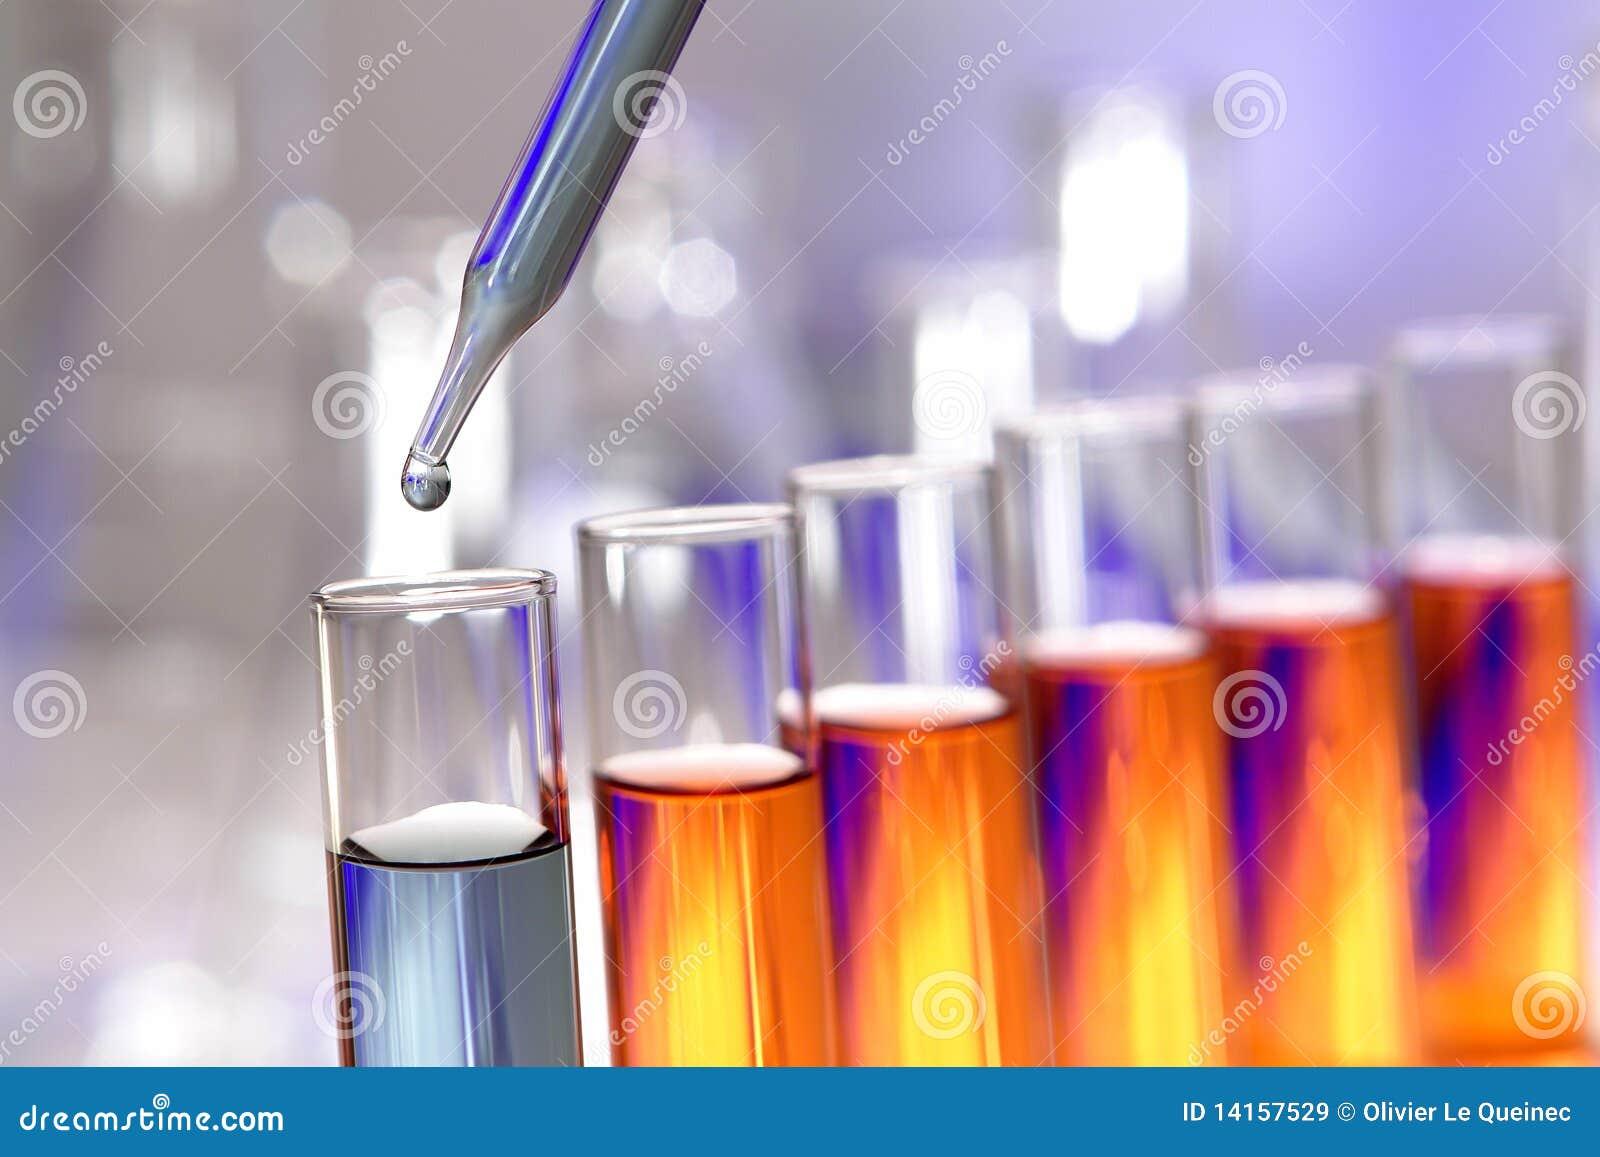 пробирки науки исследования лаборатории